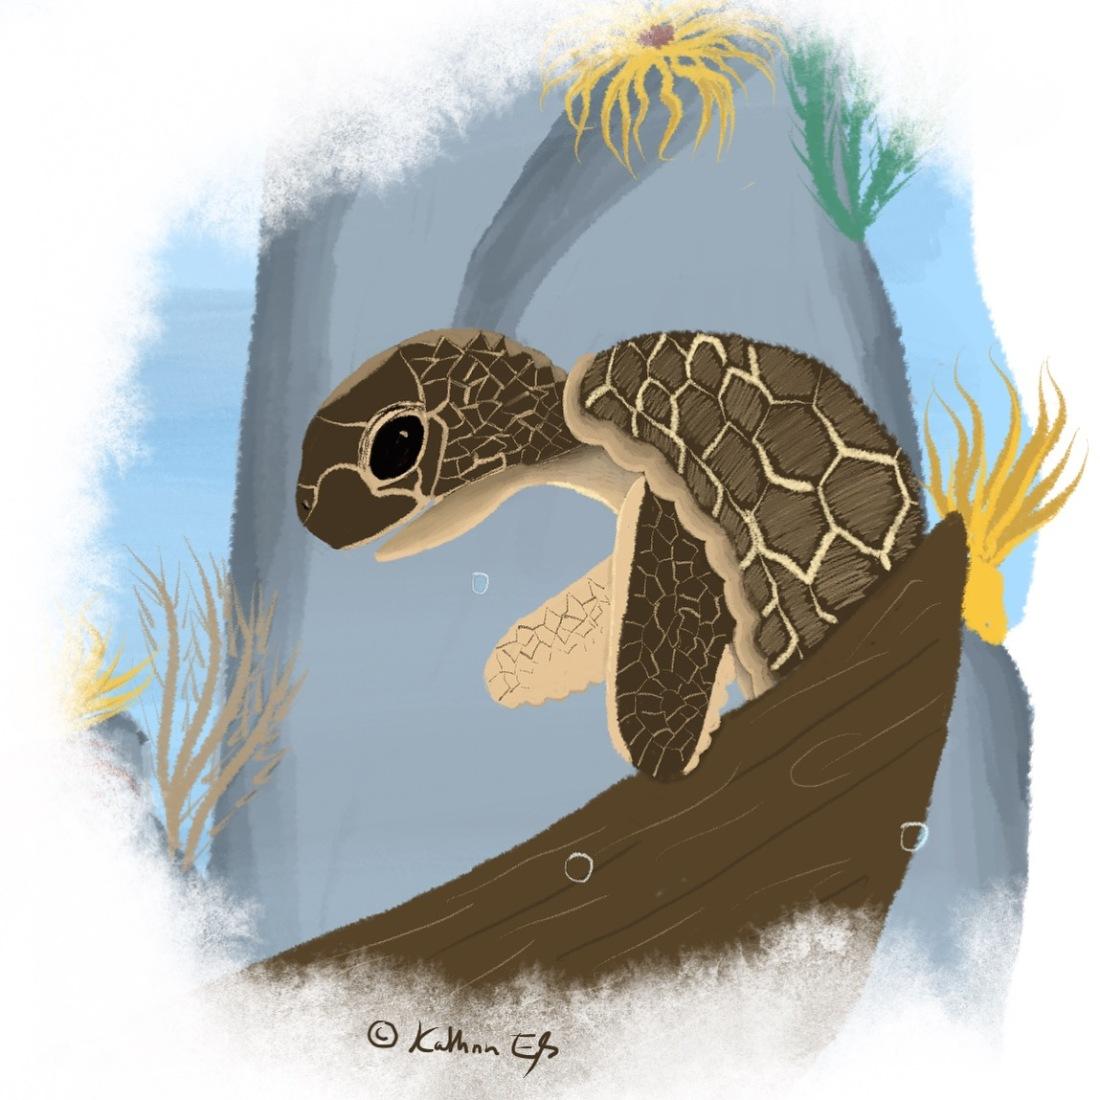 Meeresschildkröte (c) KathrinEß 2018